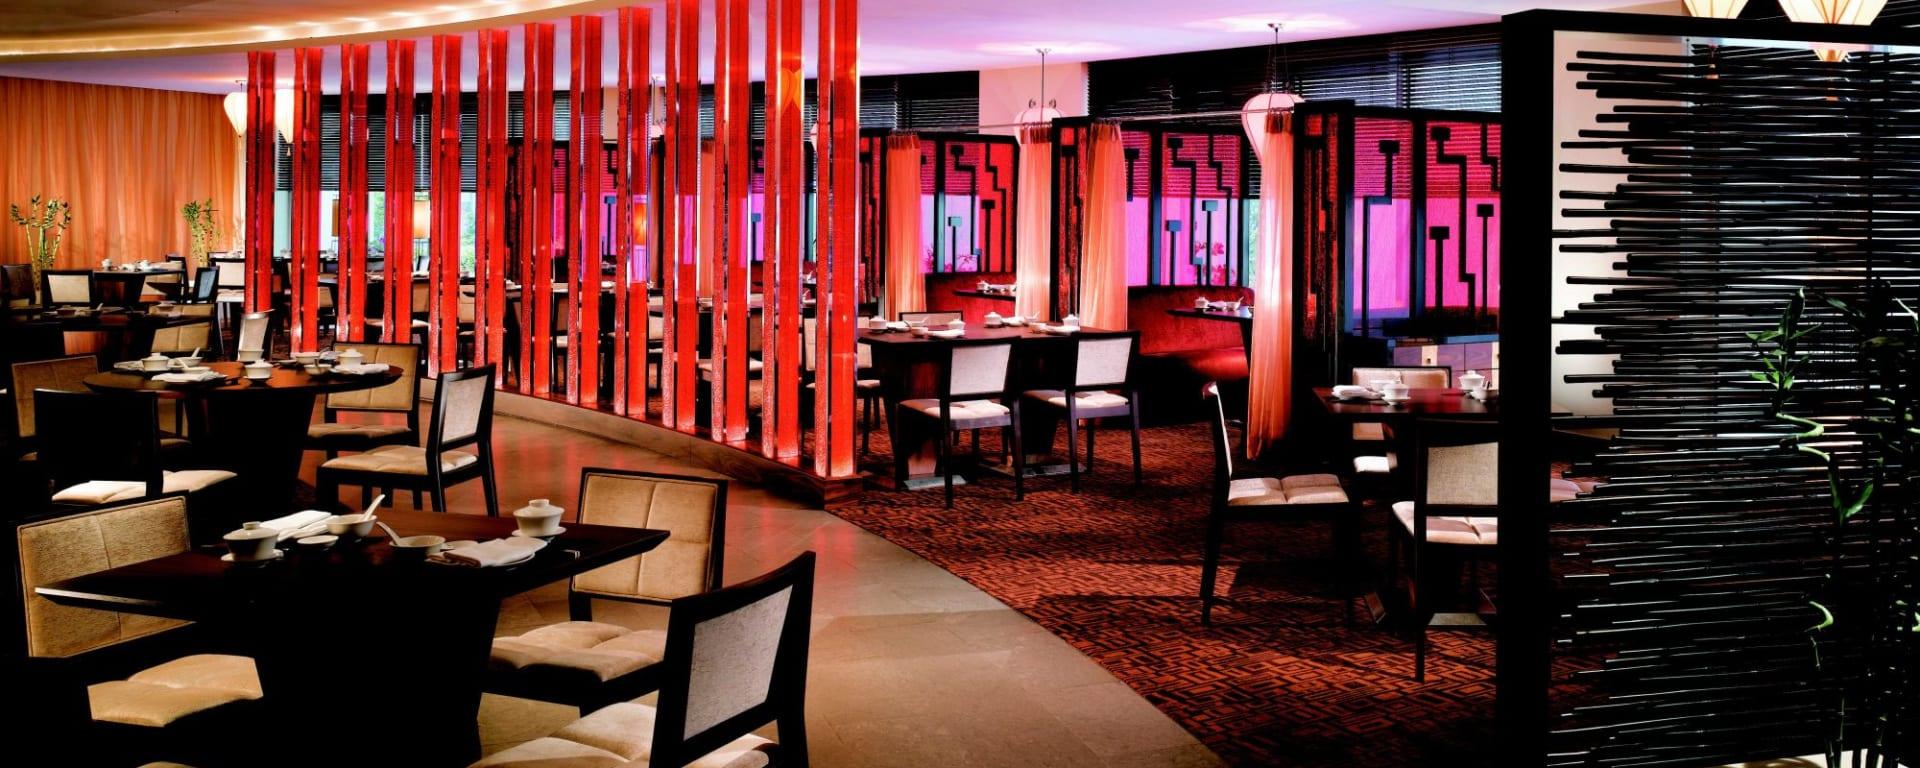 Swissotel The Stamford à Singapour: Szechuan Court Main Dining